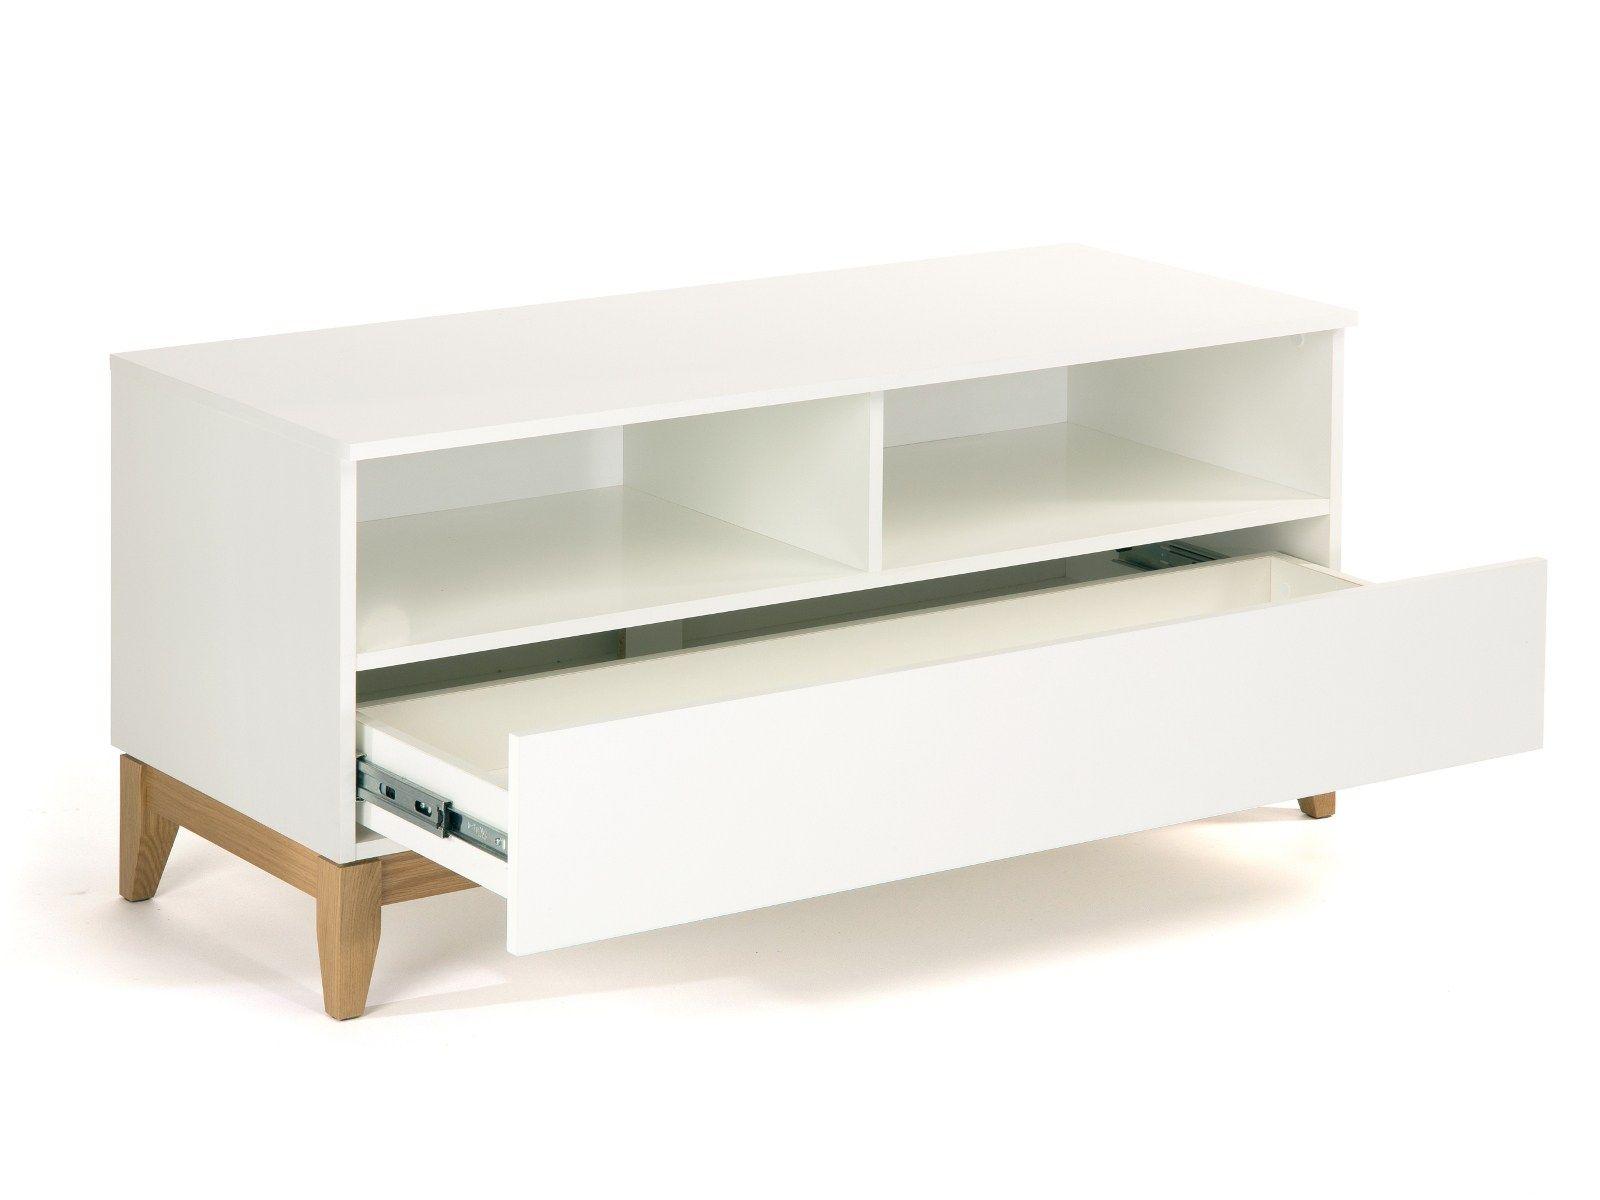 Muebles Tv Blancos Mueble Tv Blanco Madera Saln X X Cm Muebles  # Muebles Woodman